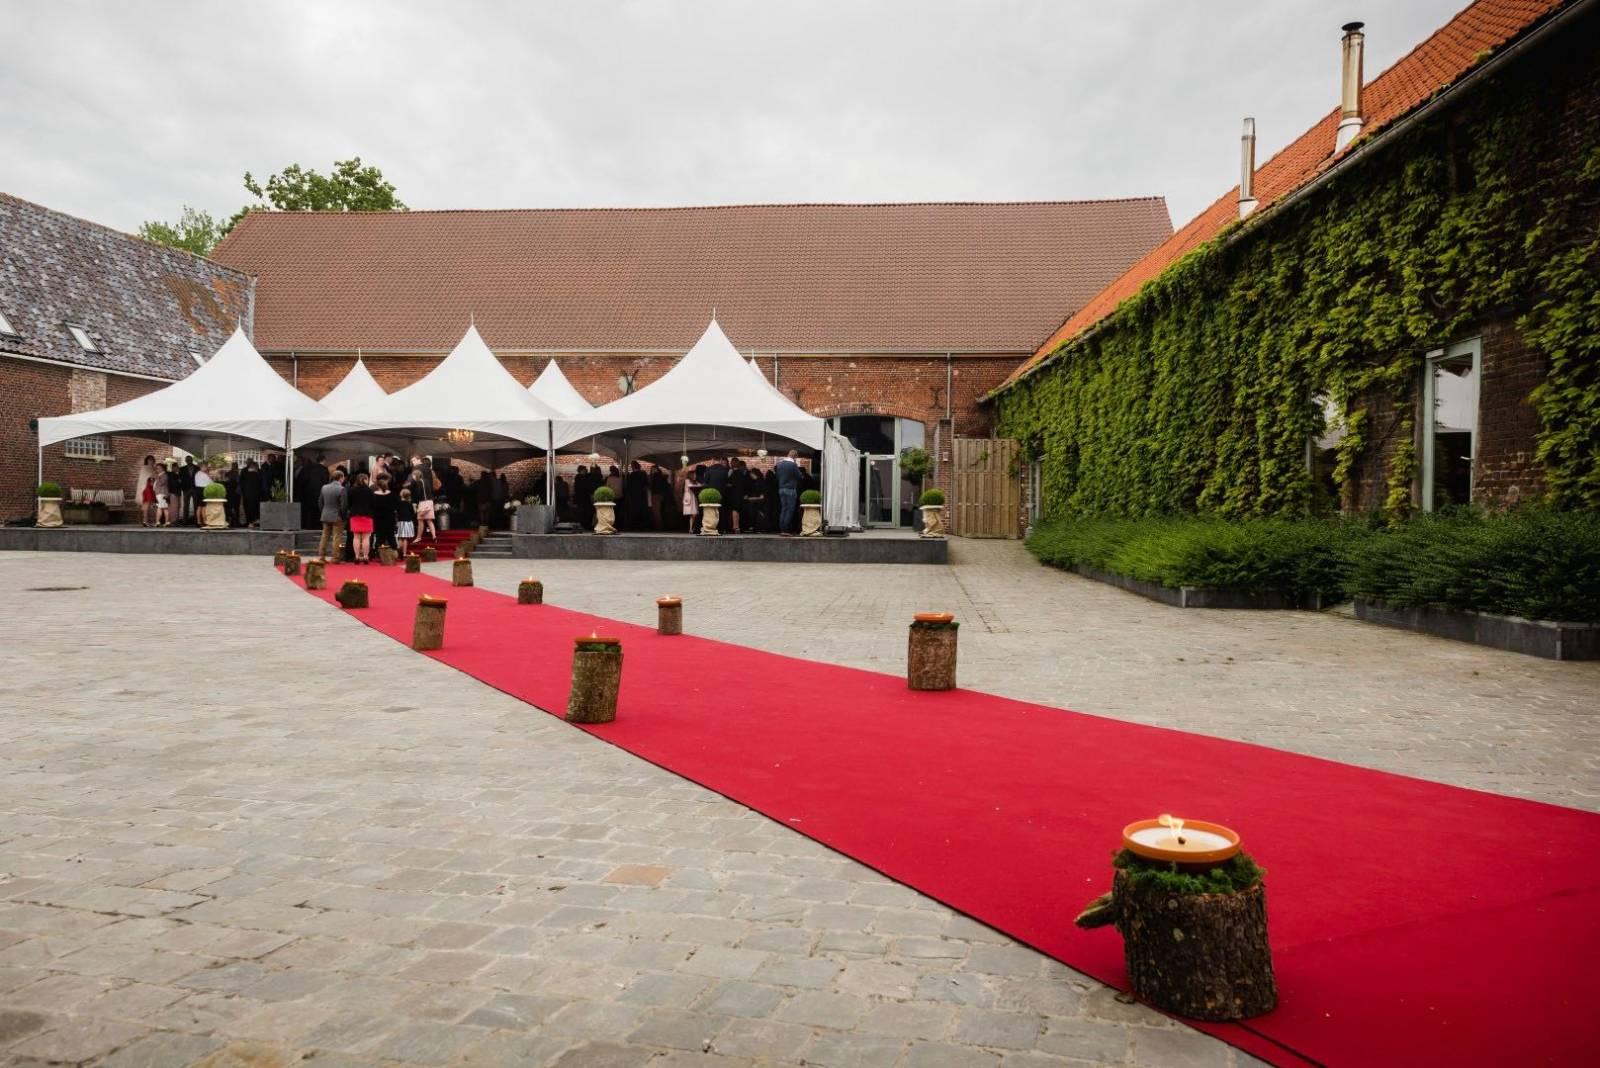 Lamont Ceremonie - Ceremonie - Eigen Foto's - House of Weddings - 2